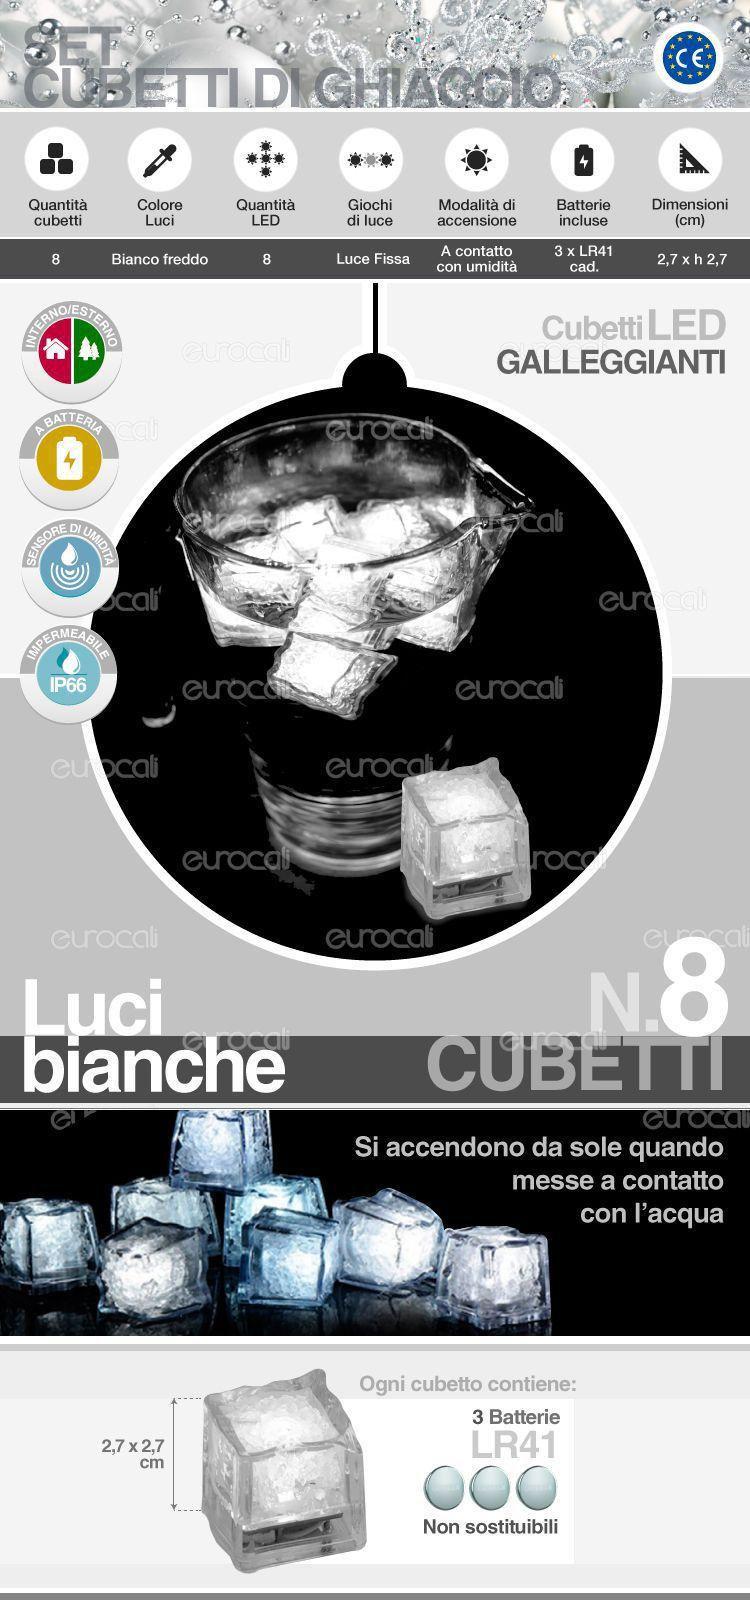 Cubetti Ghiaccio LED